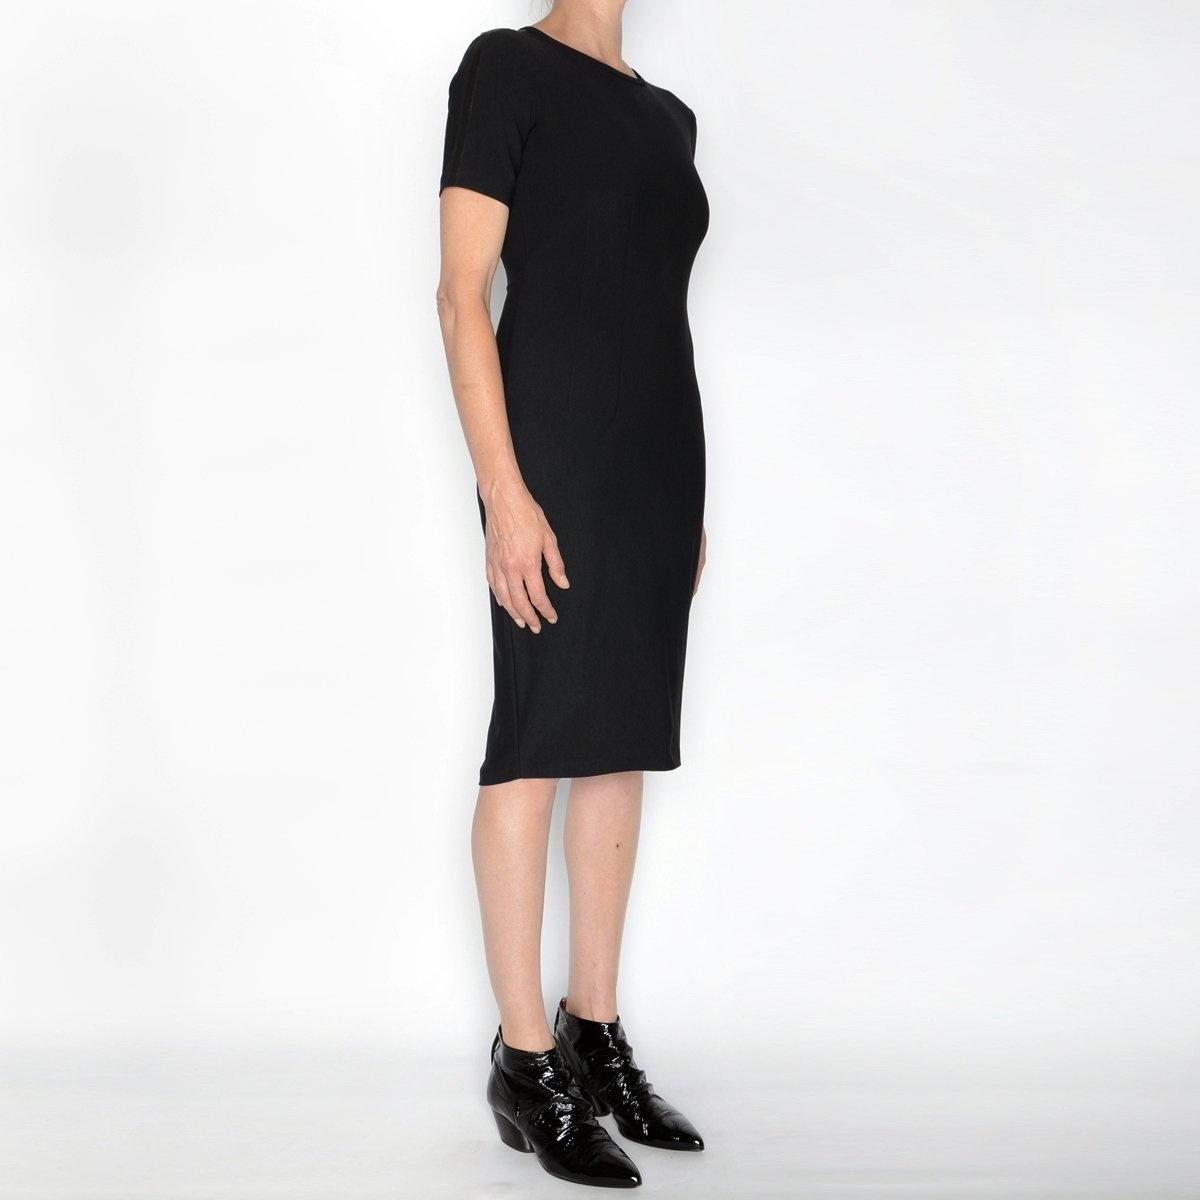 Elaine Kim Raphael Tech Stretch Dress